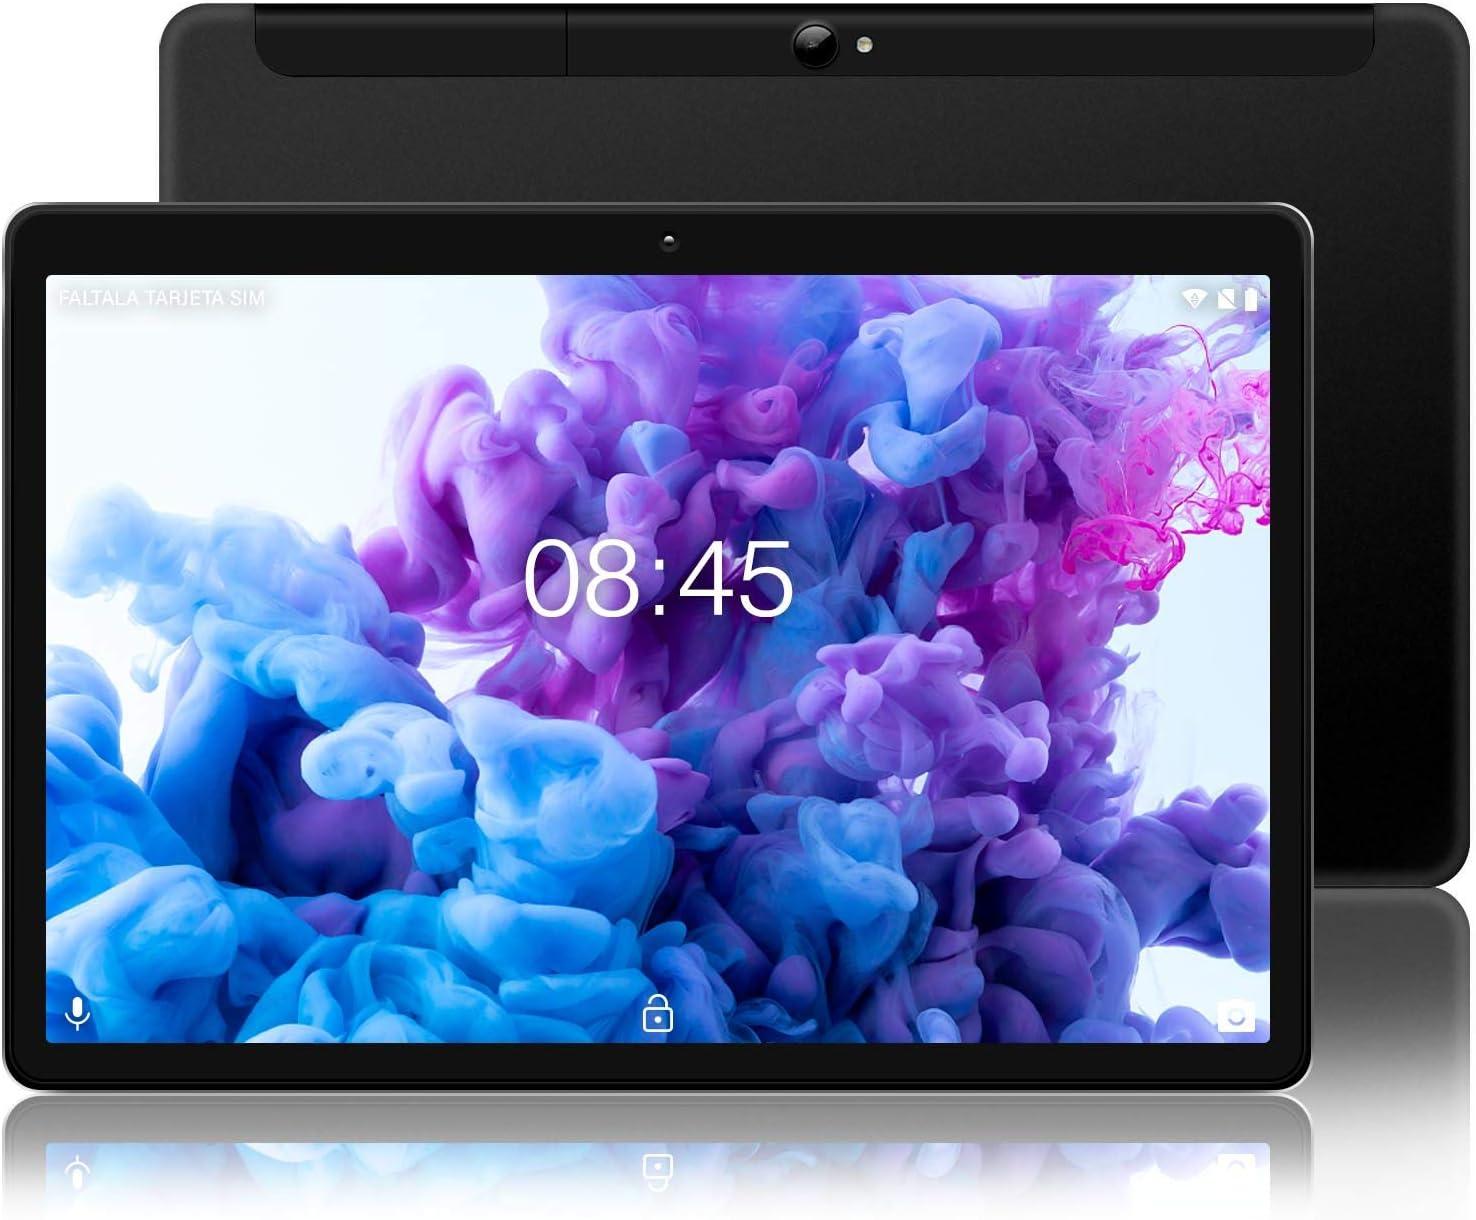 MEBERRY Tablet 10 Pulgadas Android 10.0 Ultrar-Rápido Tablets 4GB RAM + 64GB ROM - Certificación Google GSM - 4G Dual SIM - 8000mAh | WI-FI | Bluetooth | GPS |Type-C Tablet (5.0+8.0 MP Cámara) - Nergo